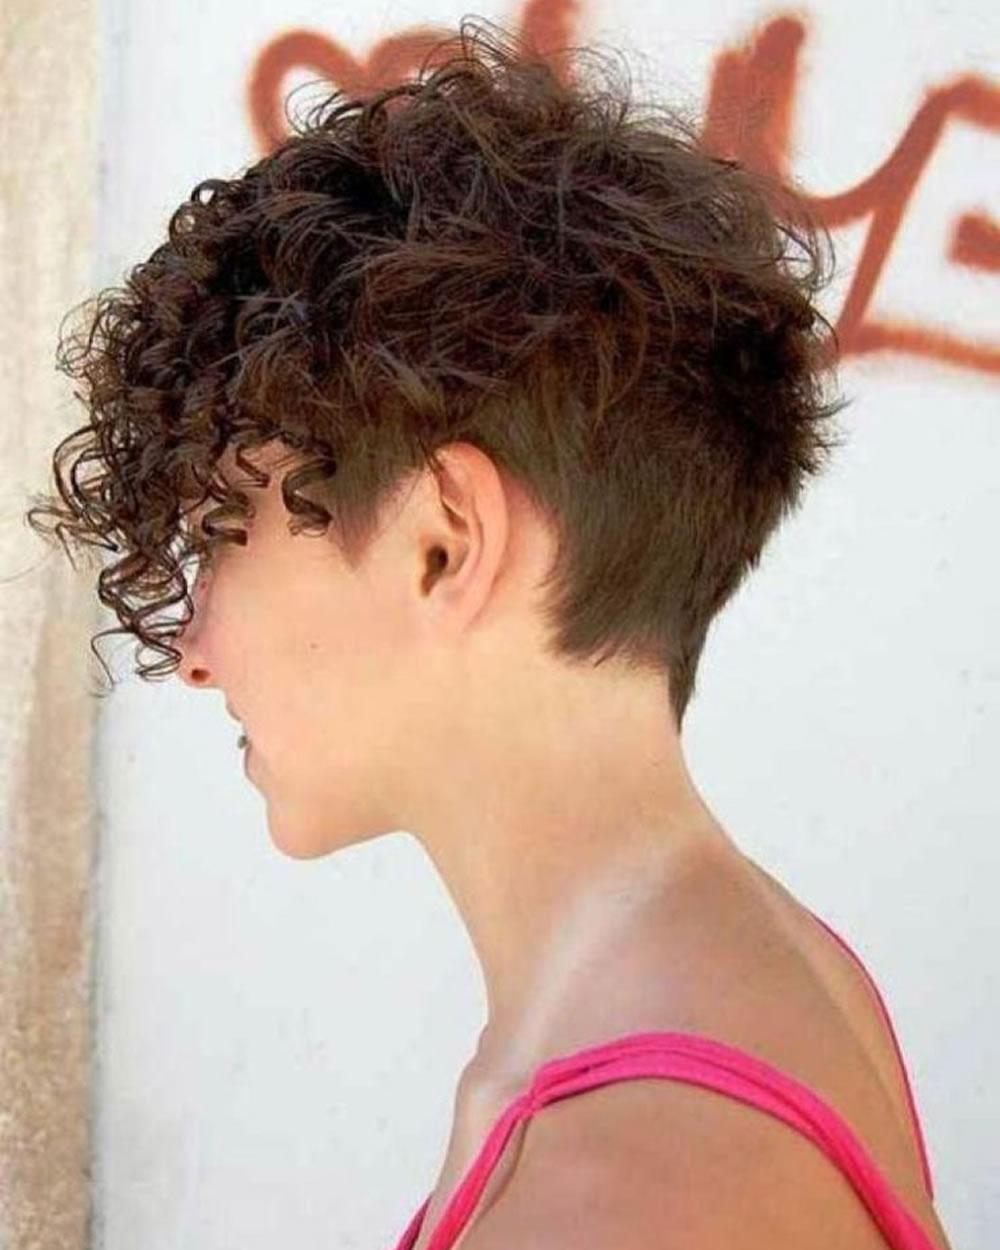 Undercut Hair Design for Women - Undercut Hairstyles 2018 2